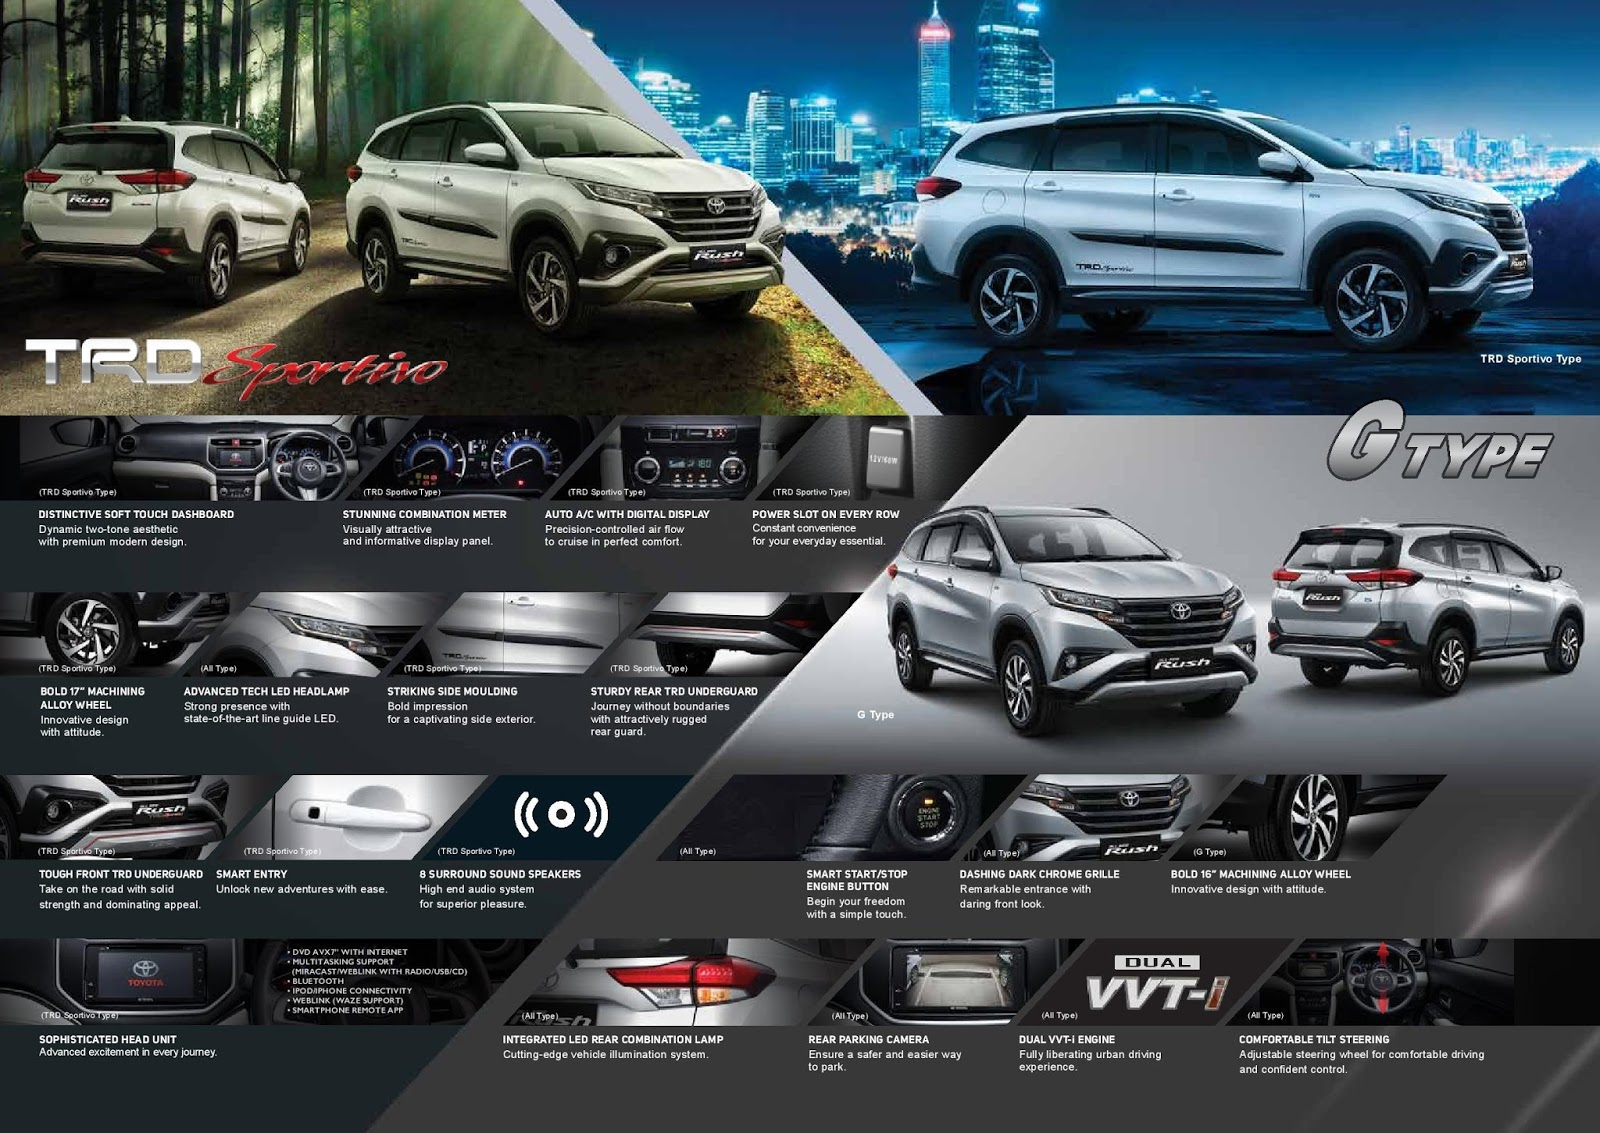 Spesifikasi Grand New Veloz Harga All Kijang Innova Q Brosur Toyota Rush 2018 | Pekanbaru